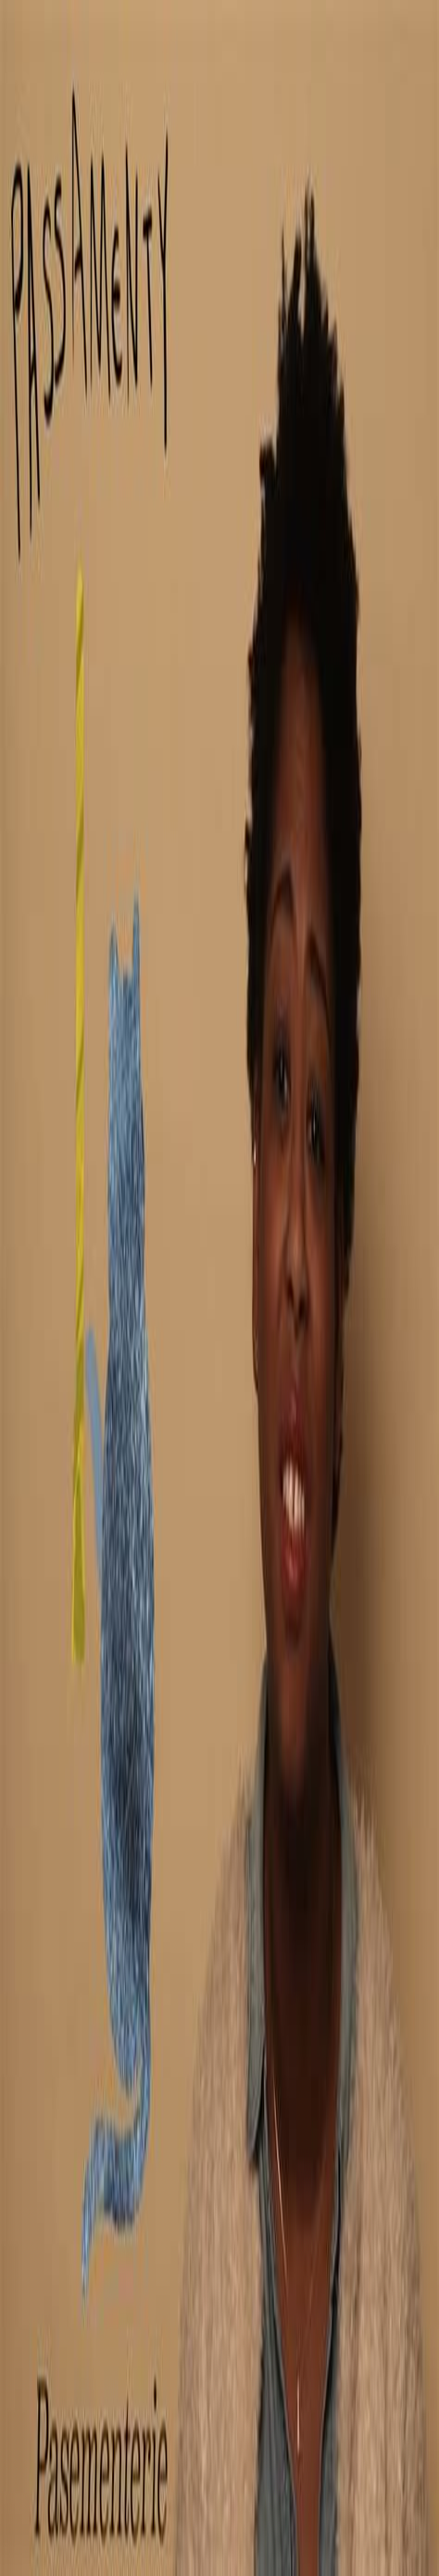 Home Decor Terms Home Decorators Catalog Best Ideas of Home Decor and Design [homedecoratorscatalog.us]